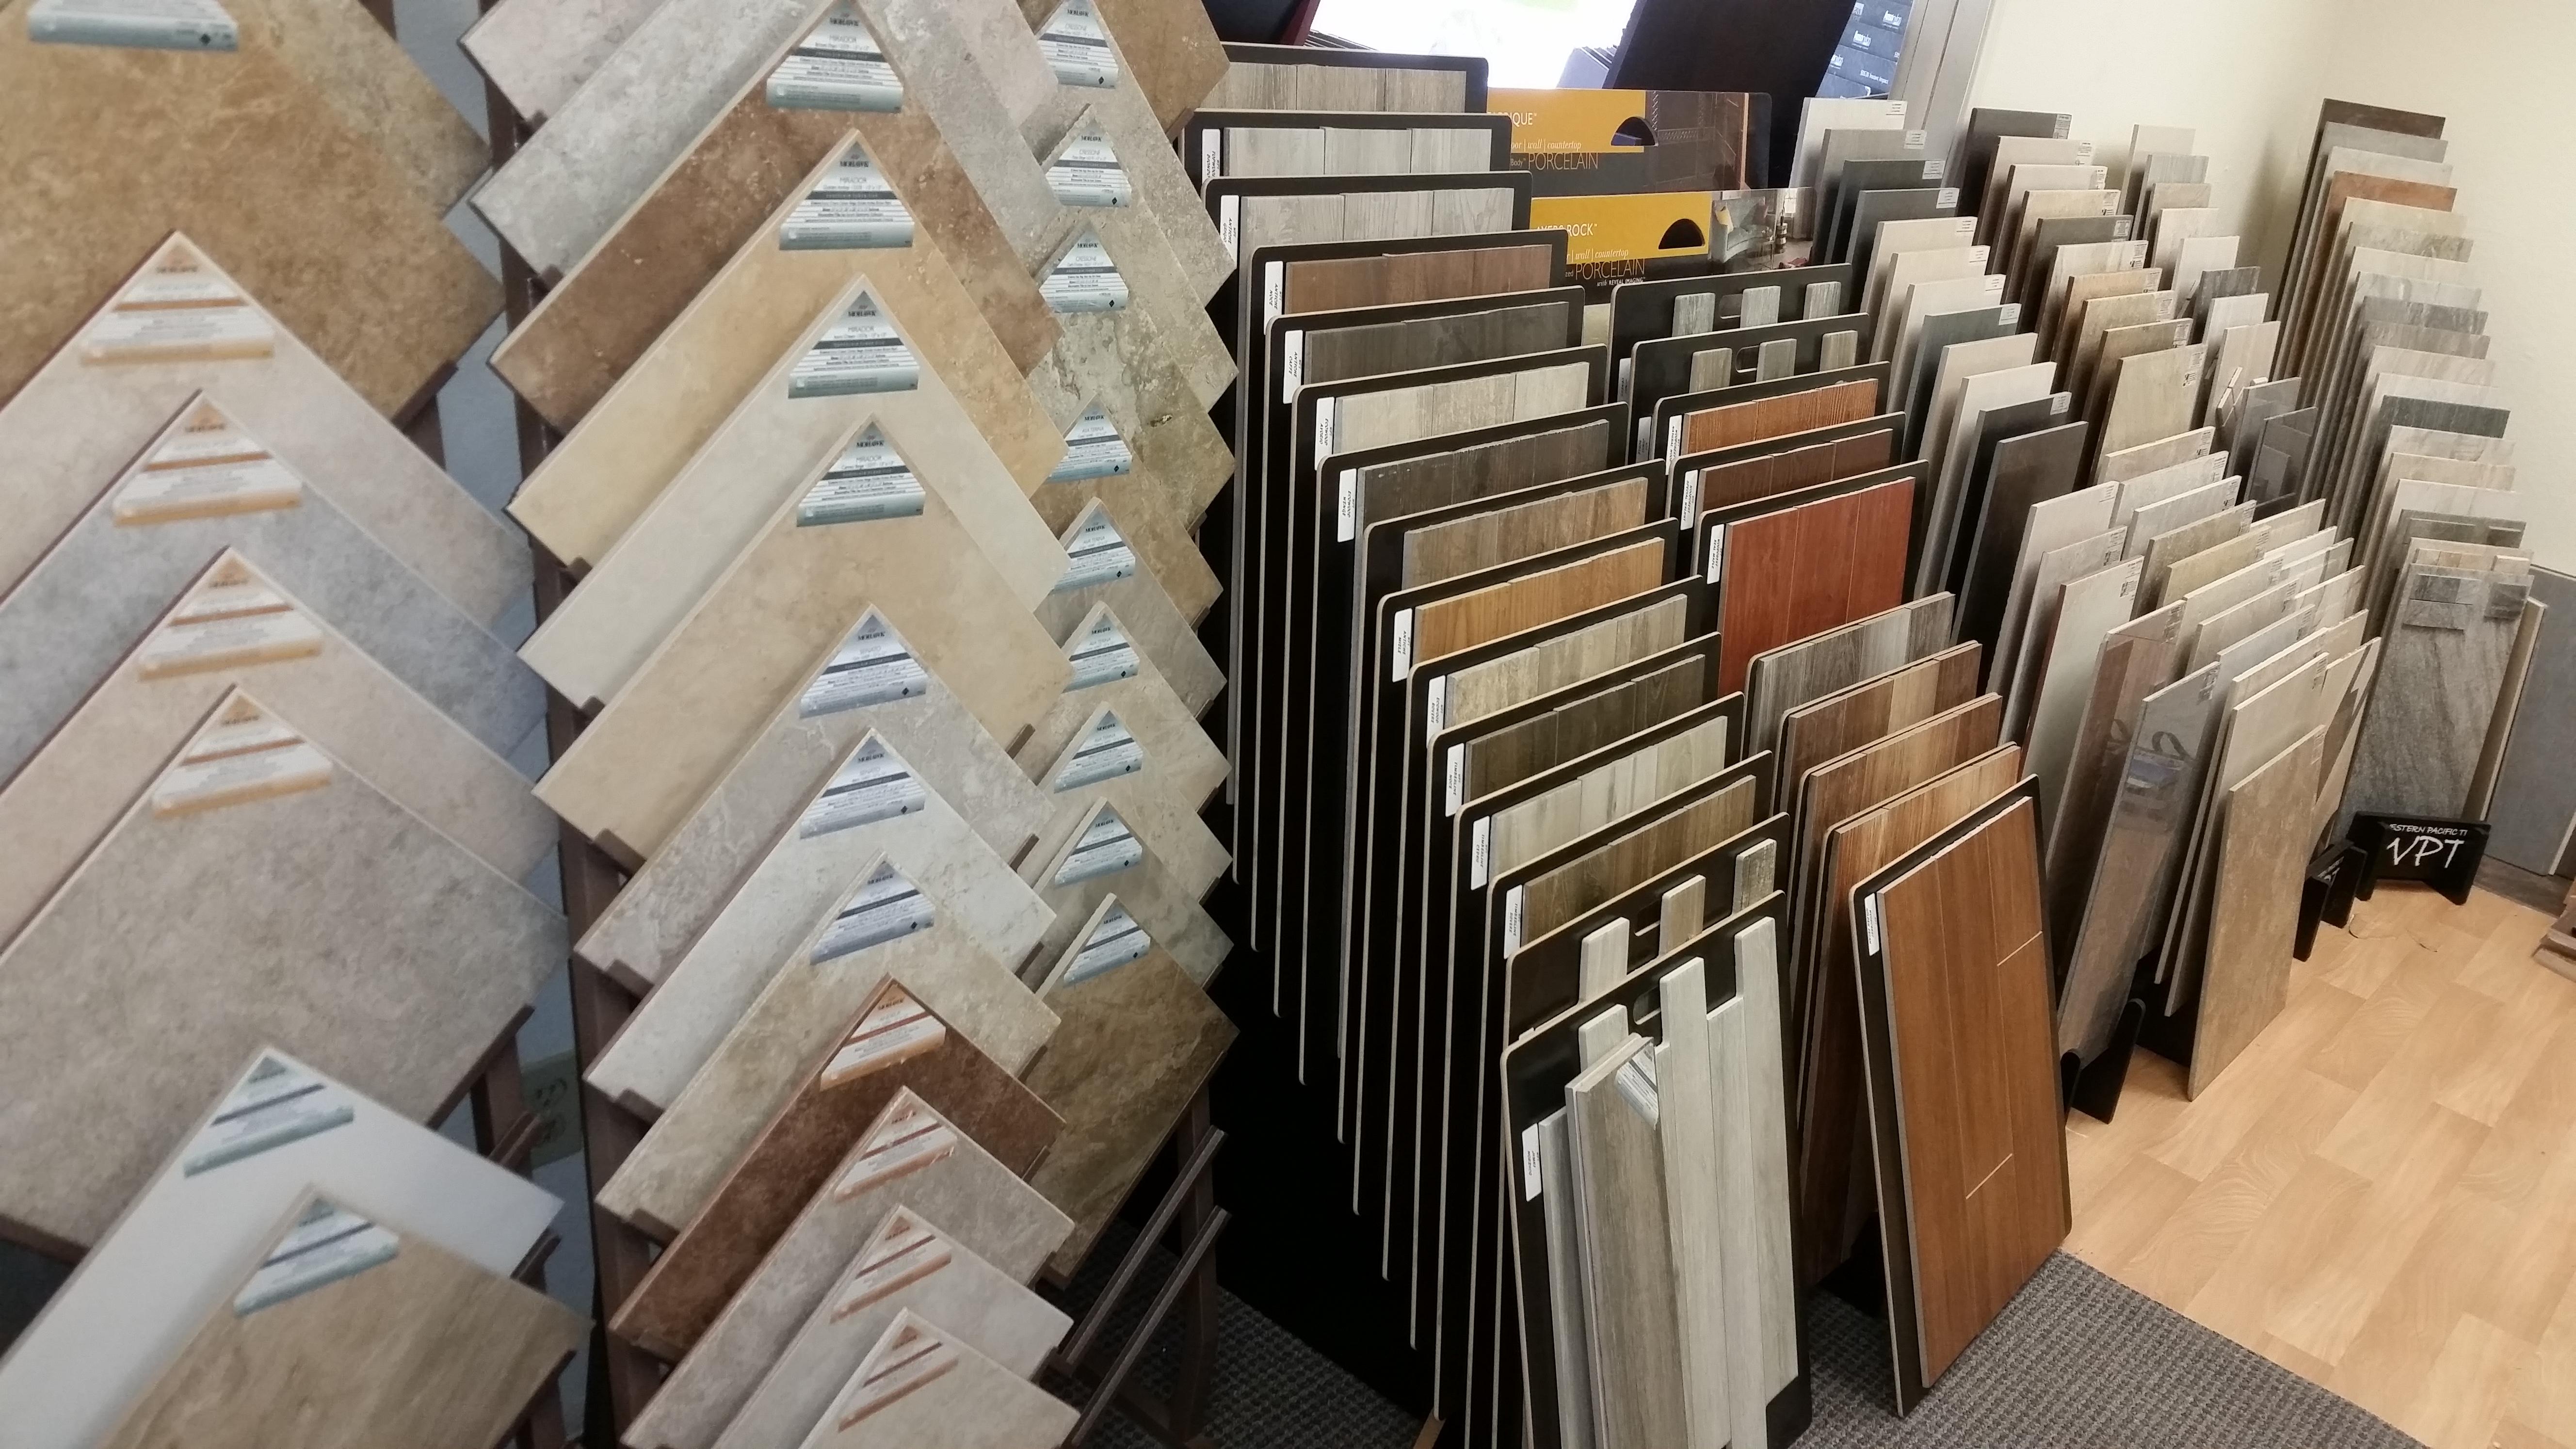 Wally's Carpet & Tile - 909 S Arrowhead Ave, San Bernardino, CA 92408